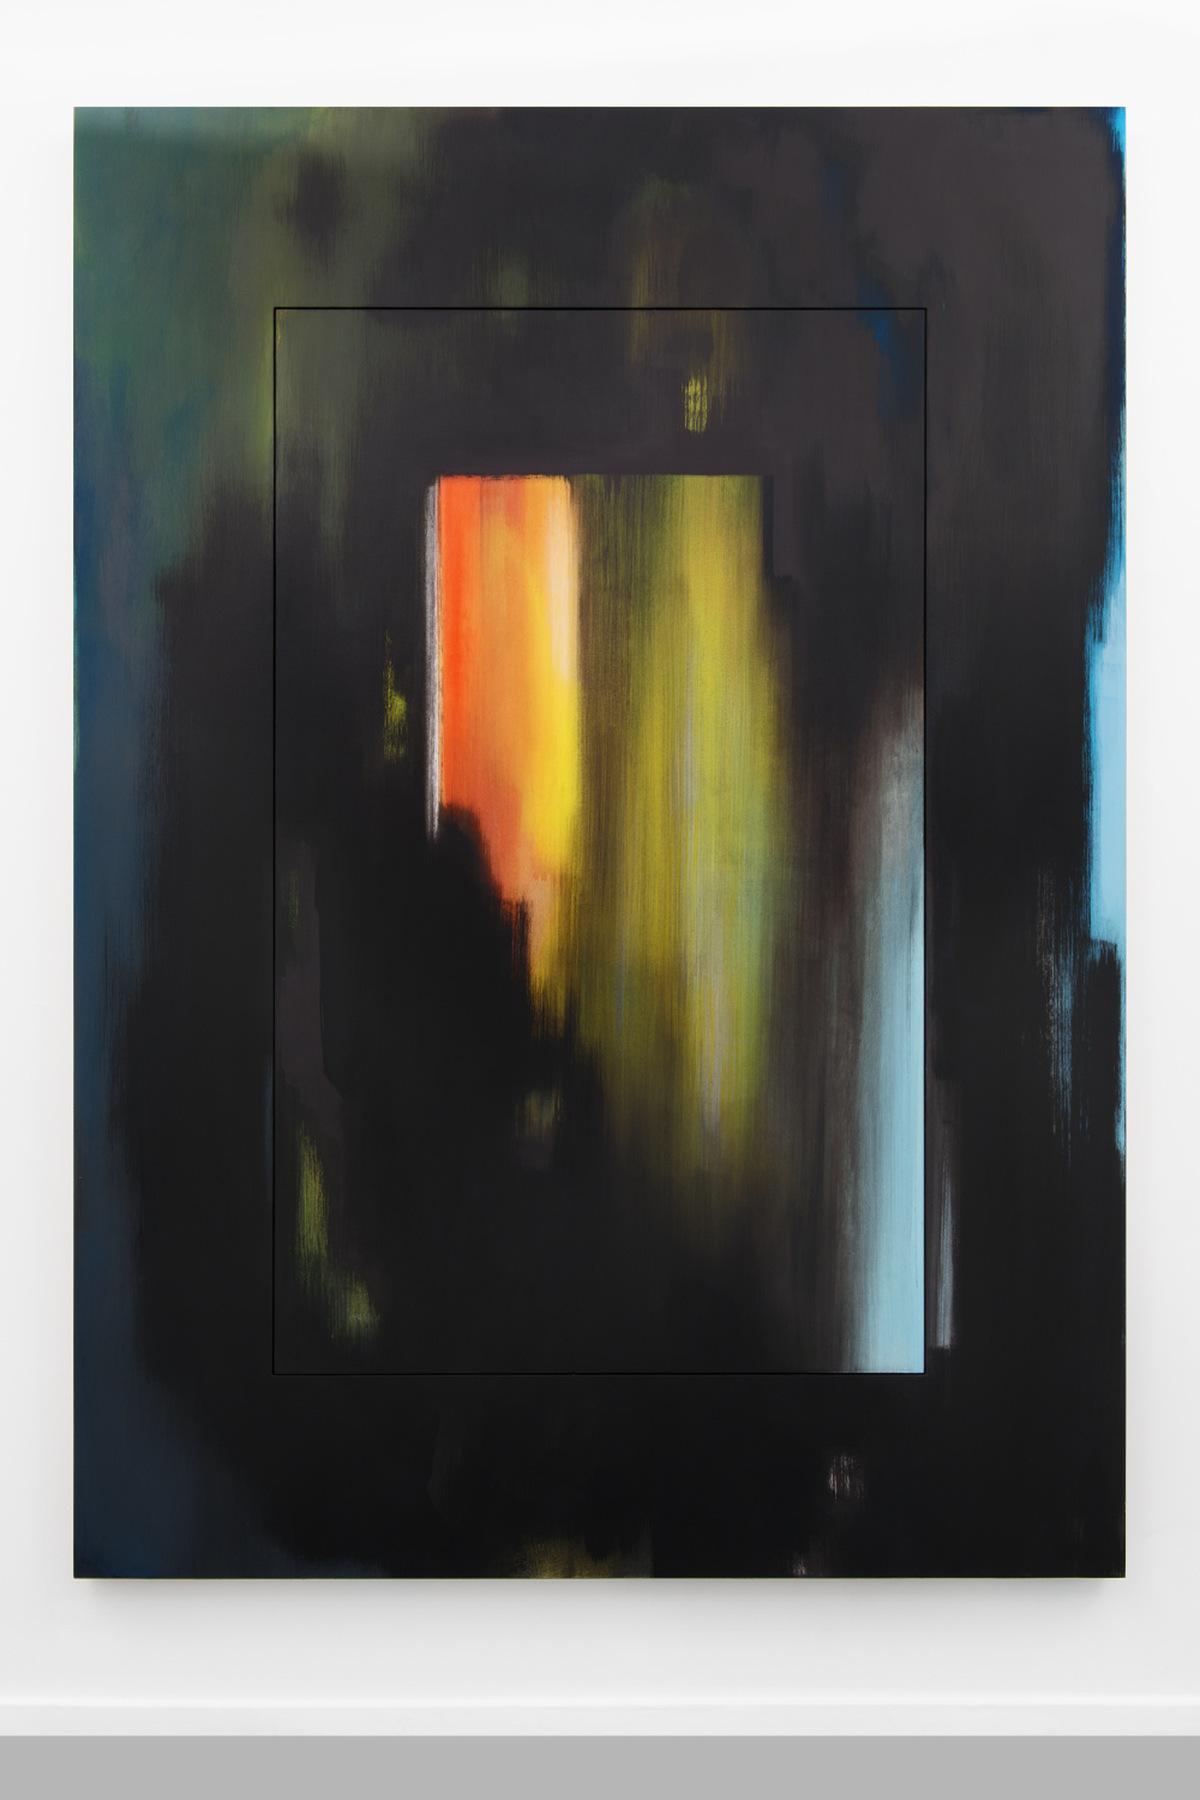 2-Esther-Tielemans-Untitled-2016-Acrylic on panel-210x150cm-image-courtesy-CINNNAMON-Rotterdam